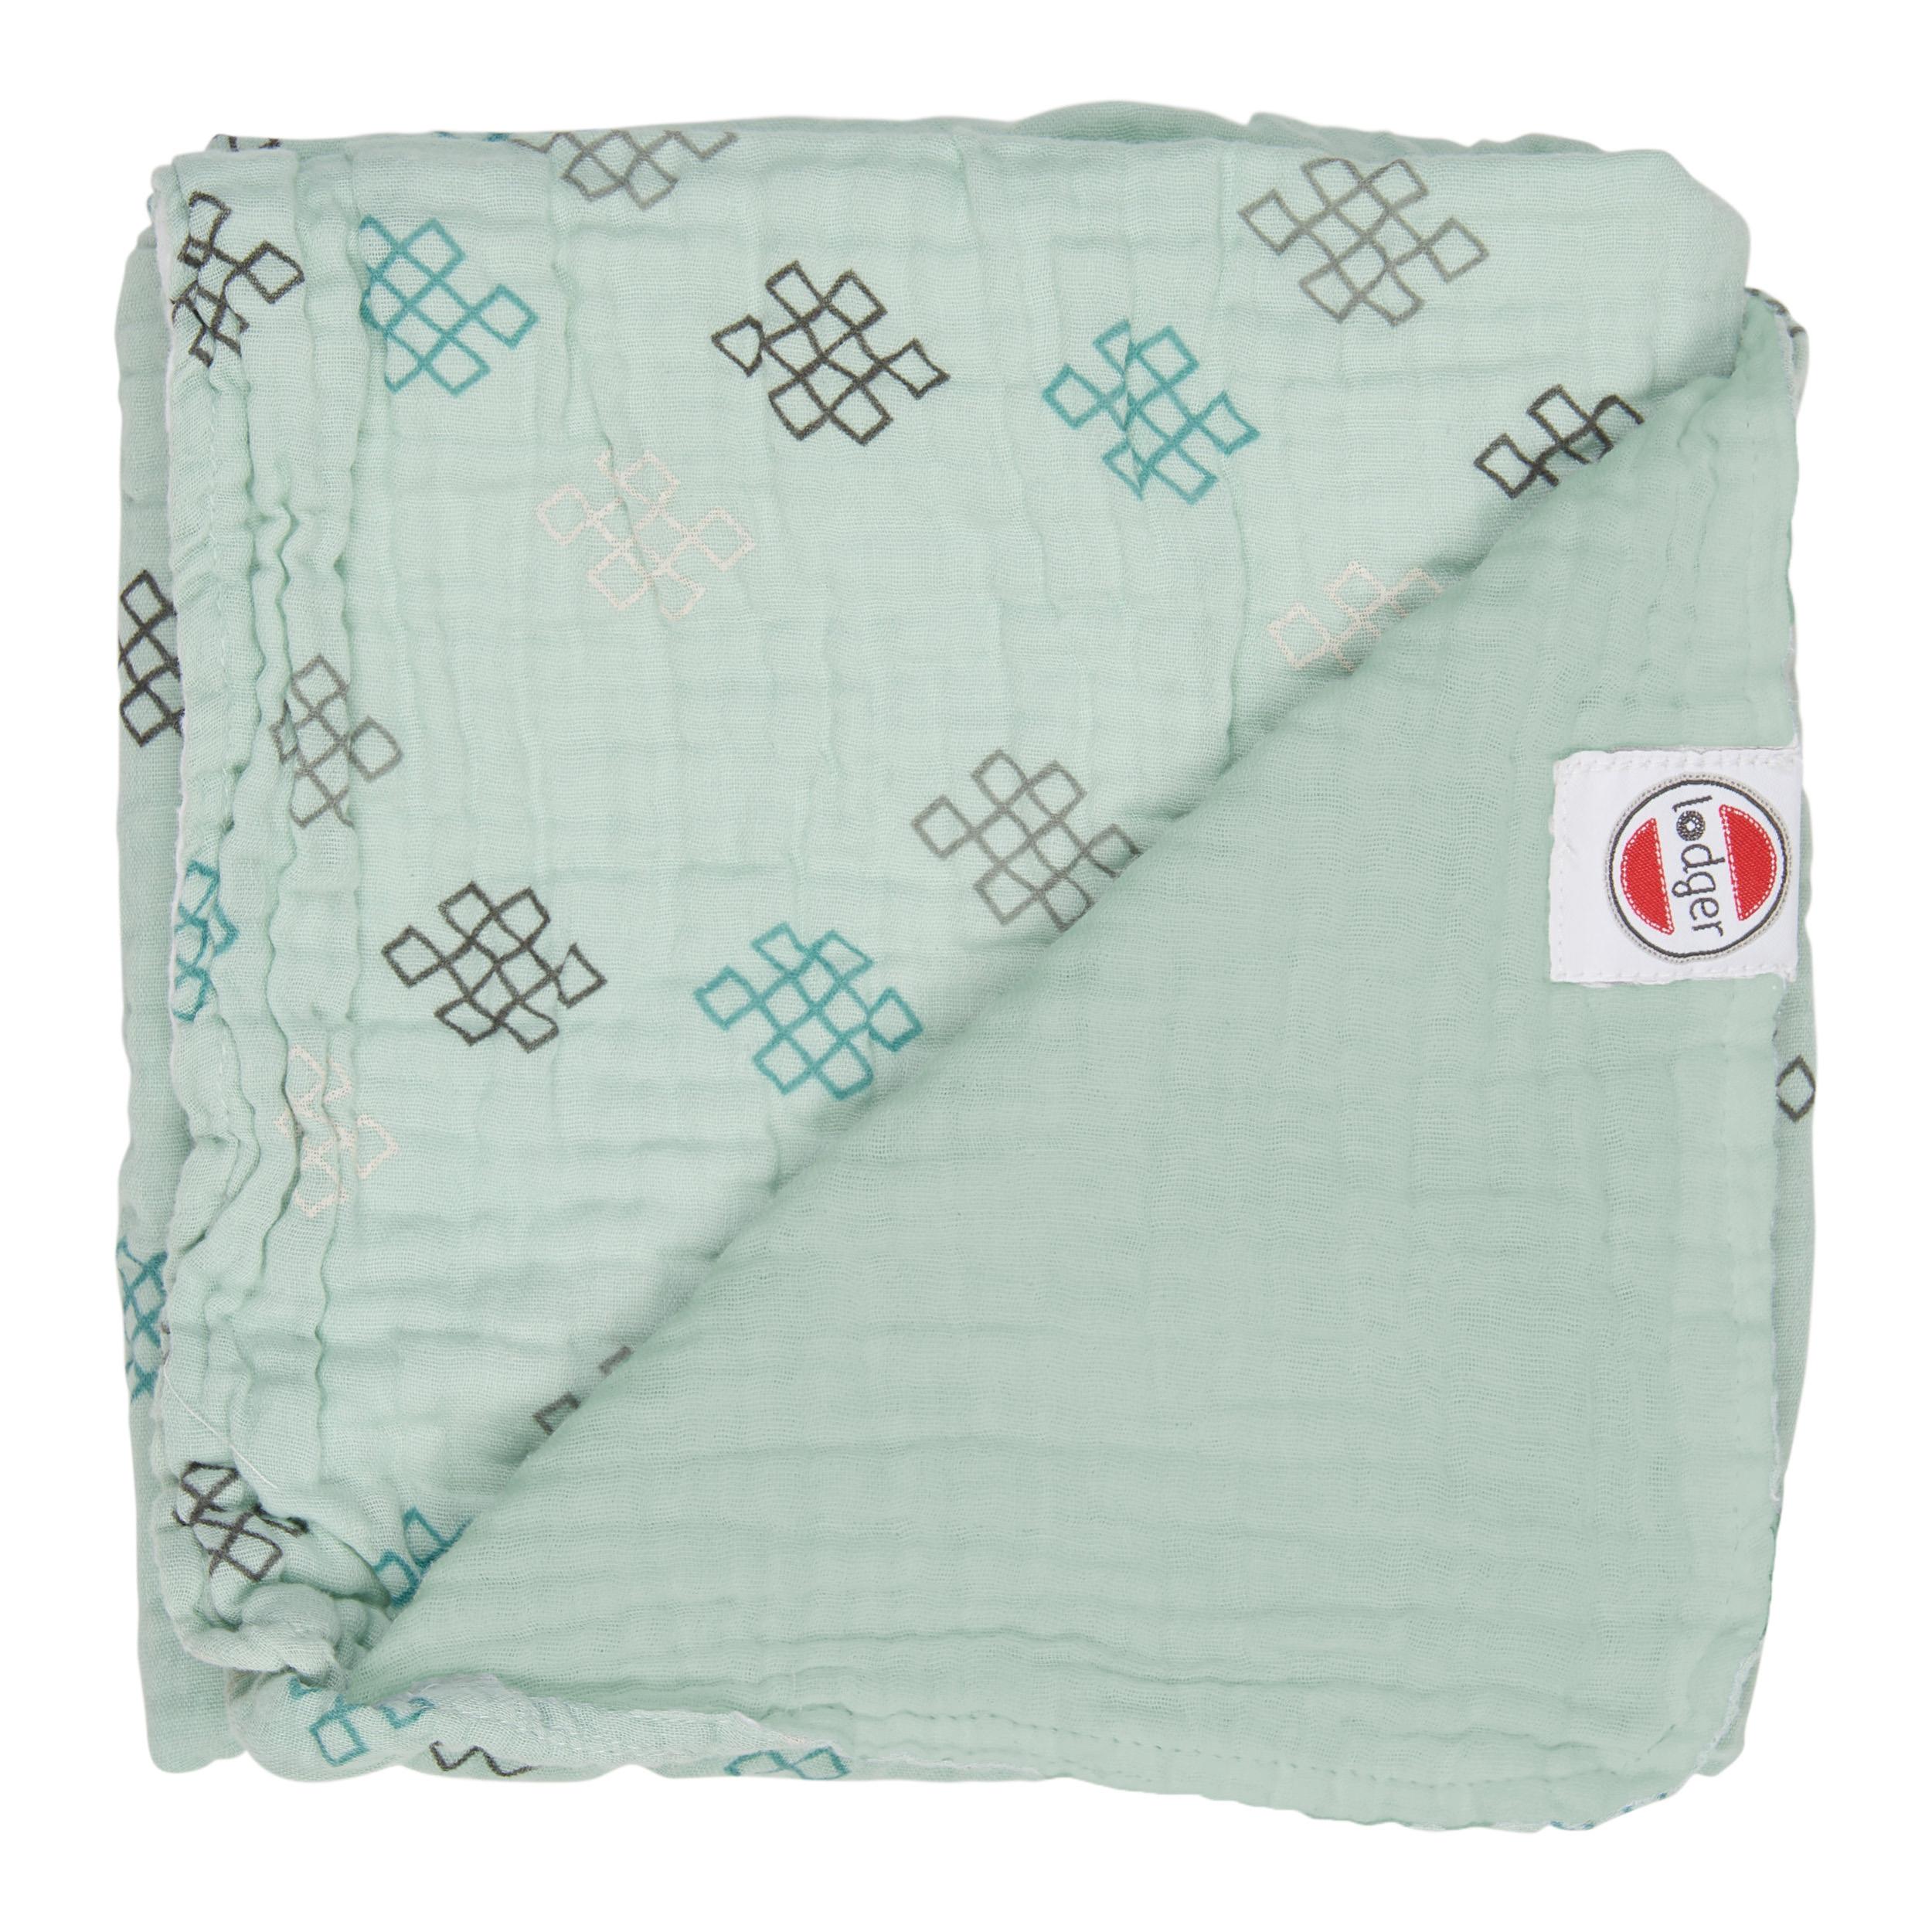 Dreamer Xandu Cotton Muslin Baby Blanket With 1 2 Tog Value